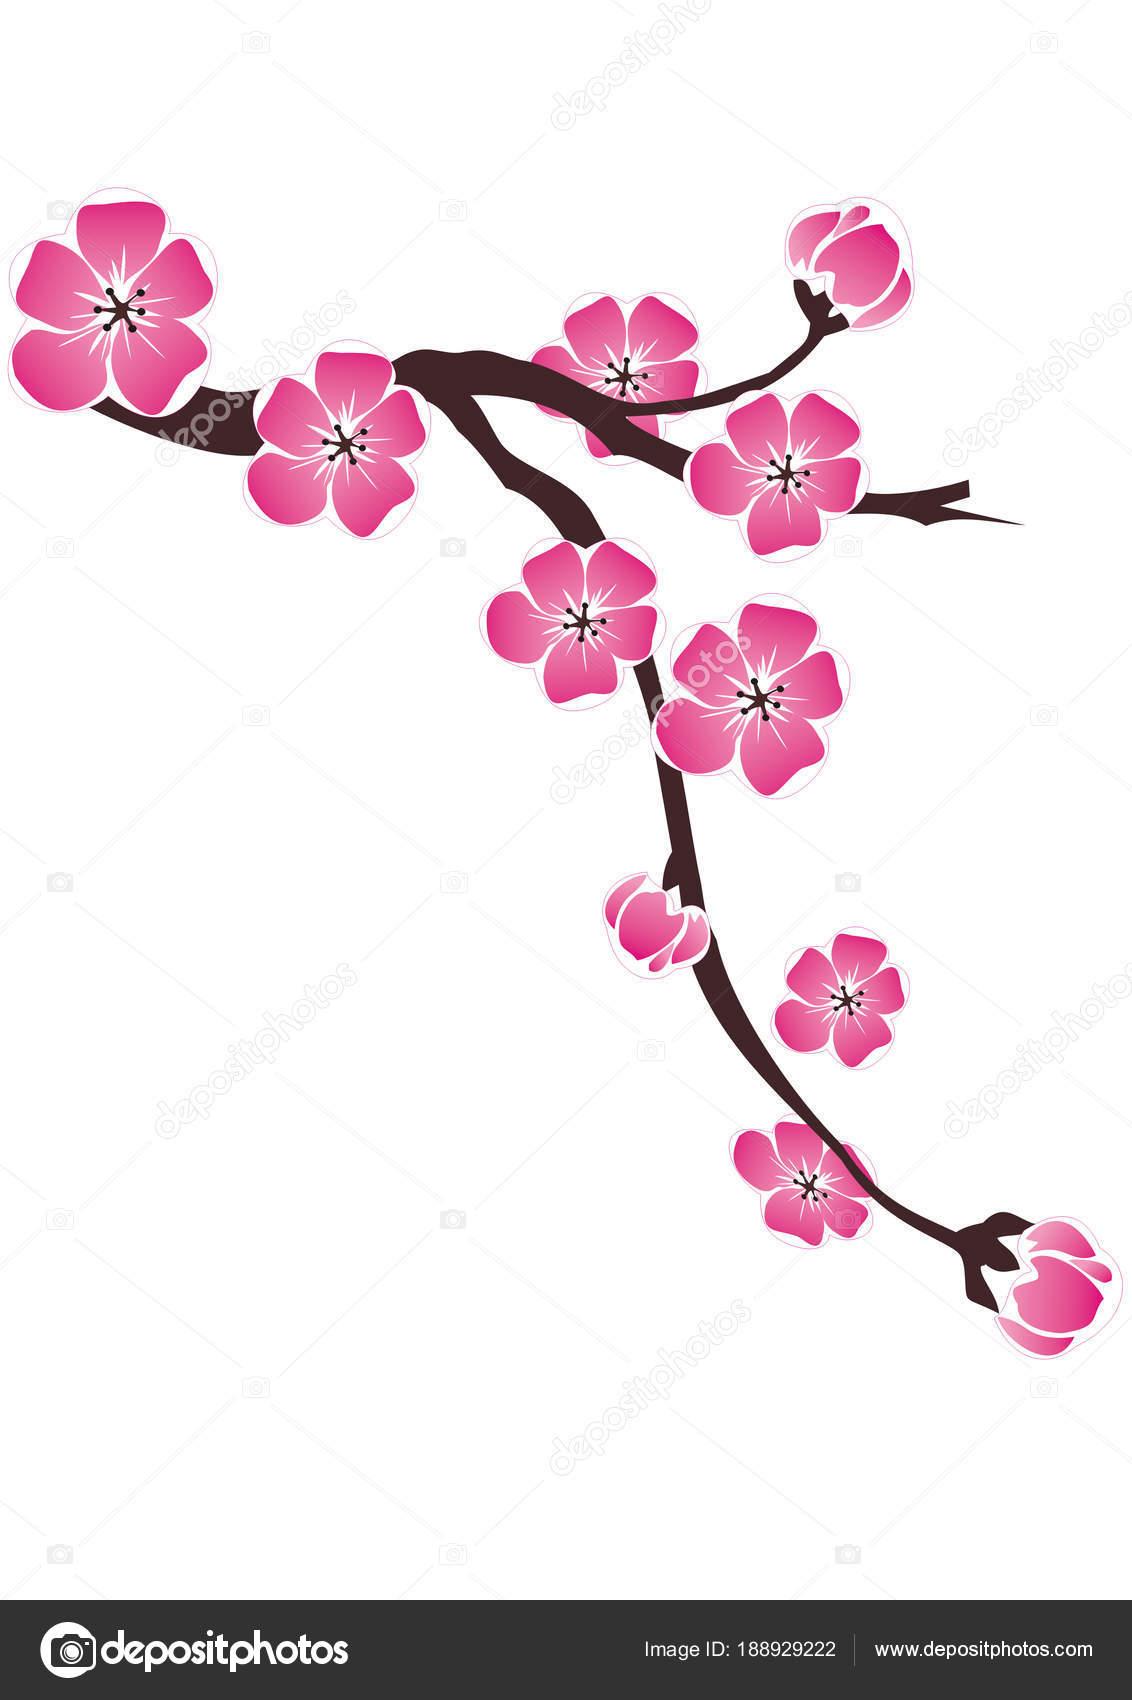 Dibujos Cerezos En Flor Rama Flores Cerezo Sobre Fondo Blanco